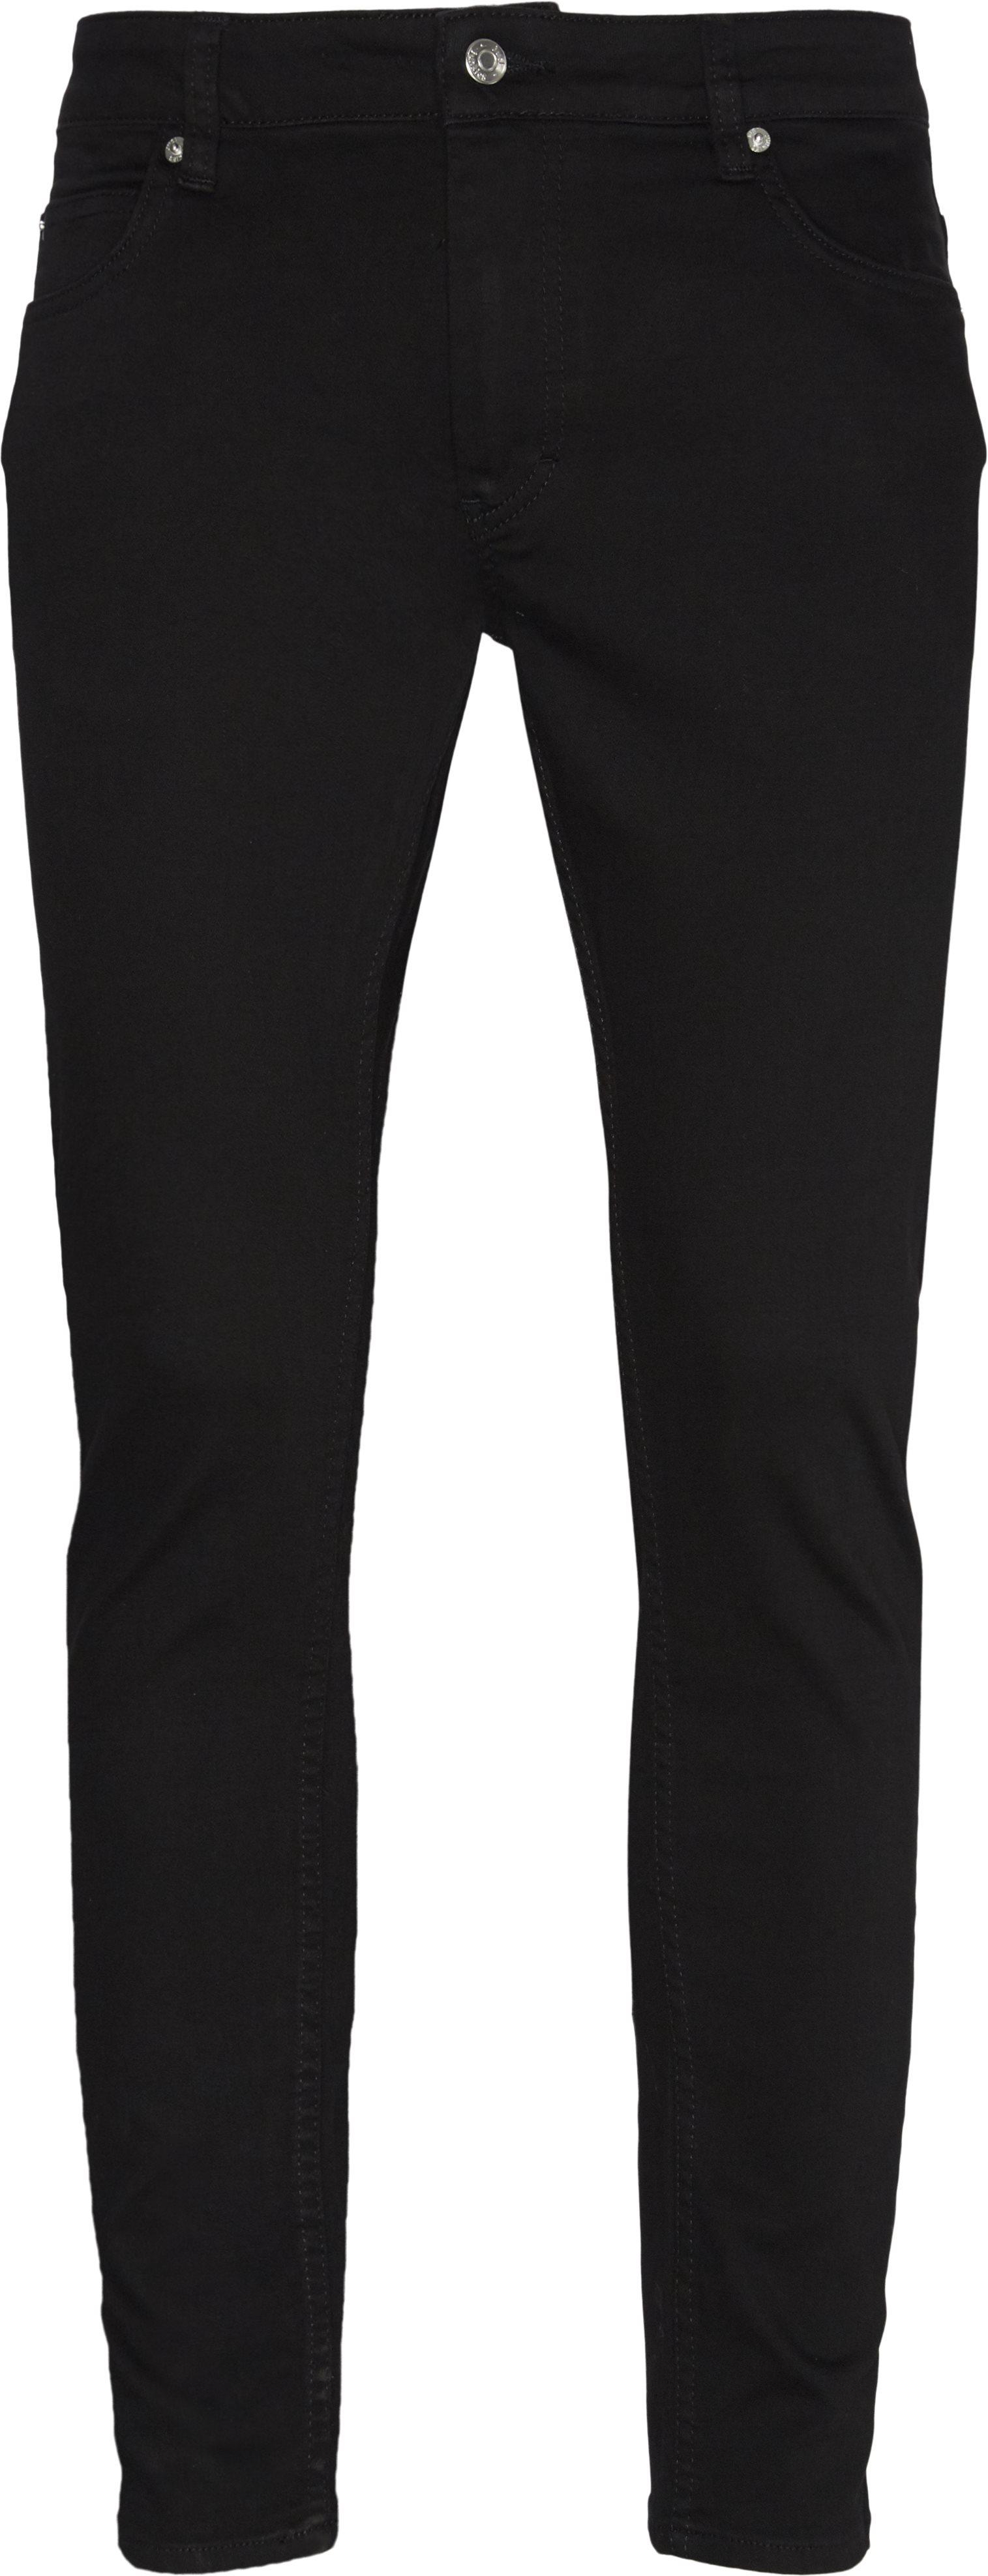 Max Black Jeans - Jeans - Slim - Sort